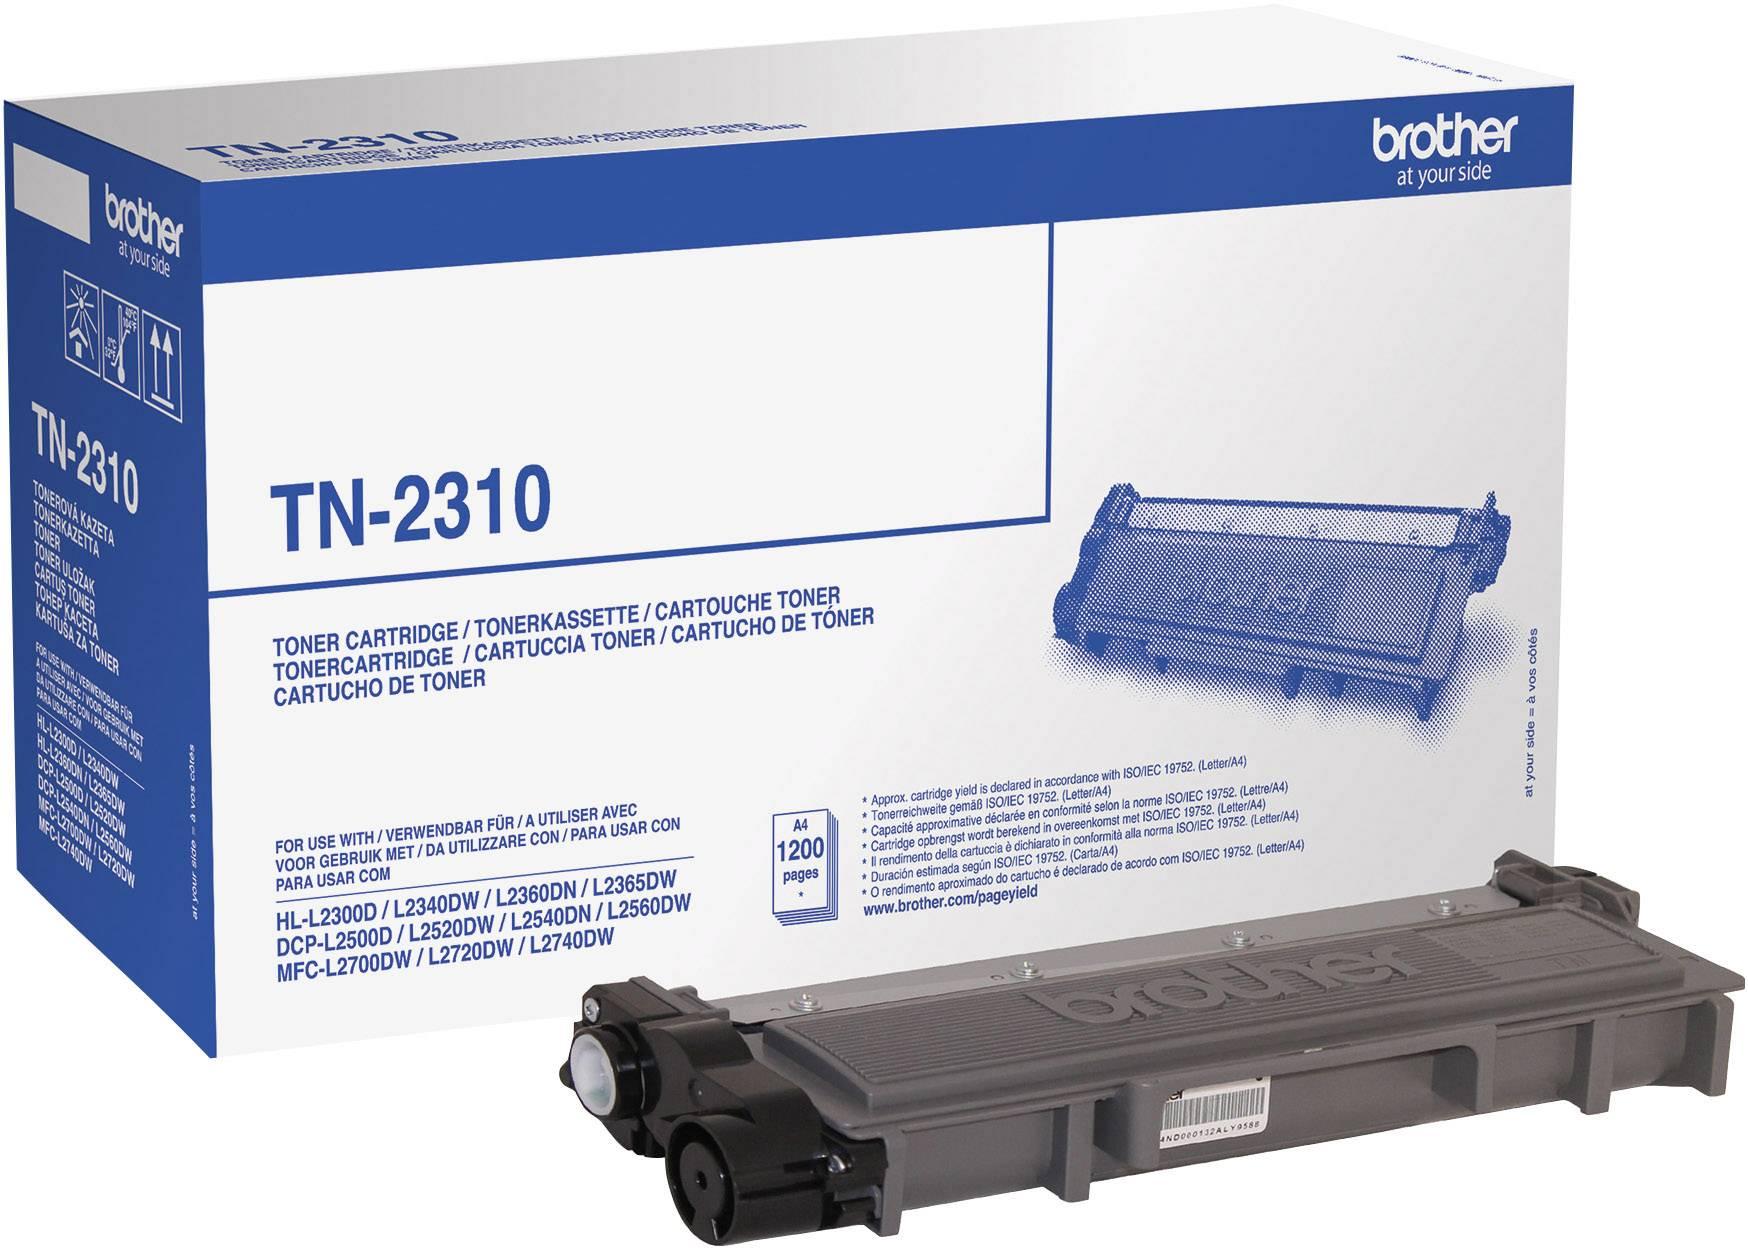 Toner originál Brother TN-2310 černá Maximální rozsah stárnek 1200 Seiten